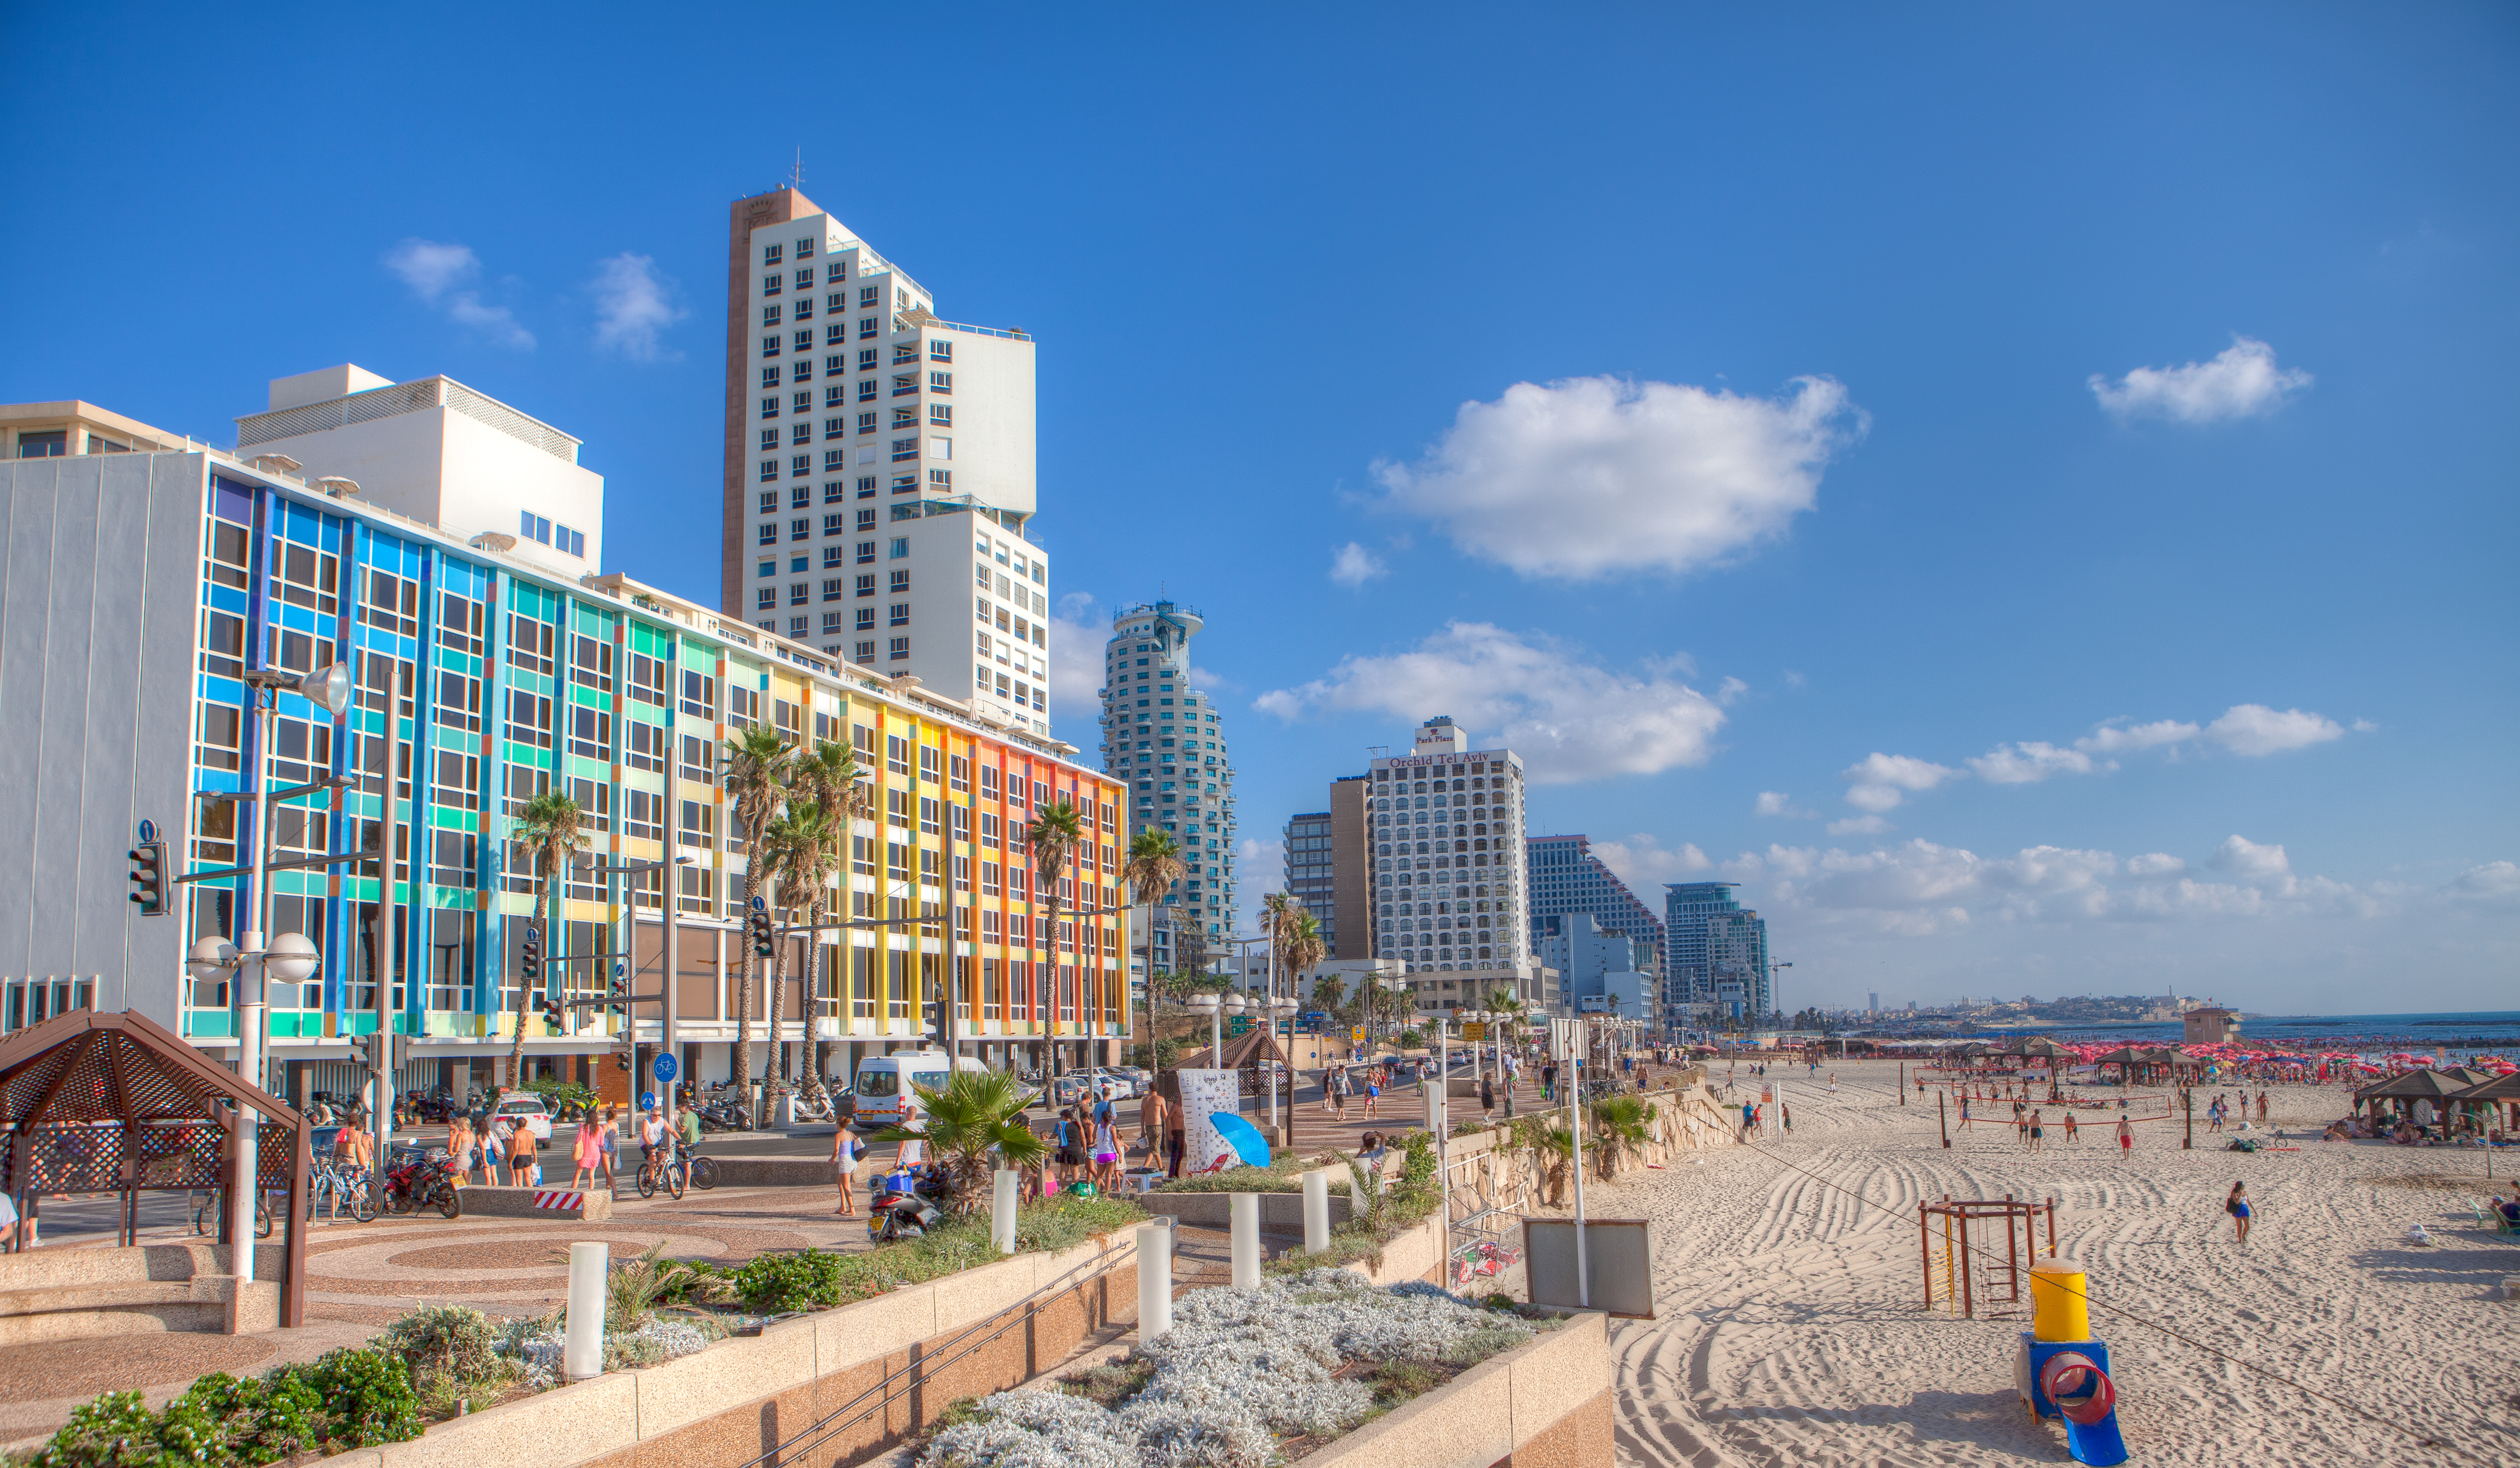 Strandpromenaden i Tel Aviv, foto: Dana Friedlander for the Israeli Ministry of Tourism.